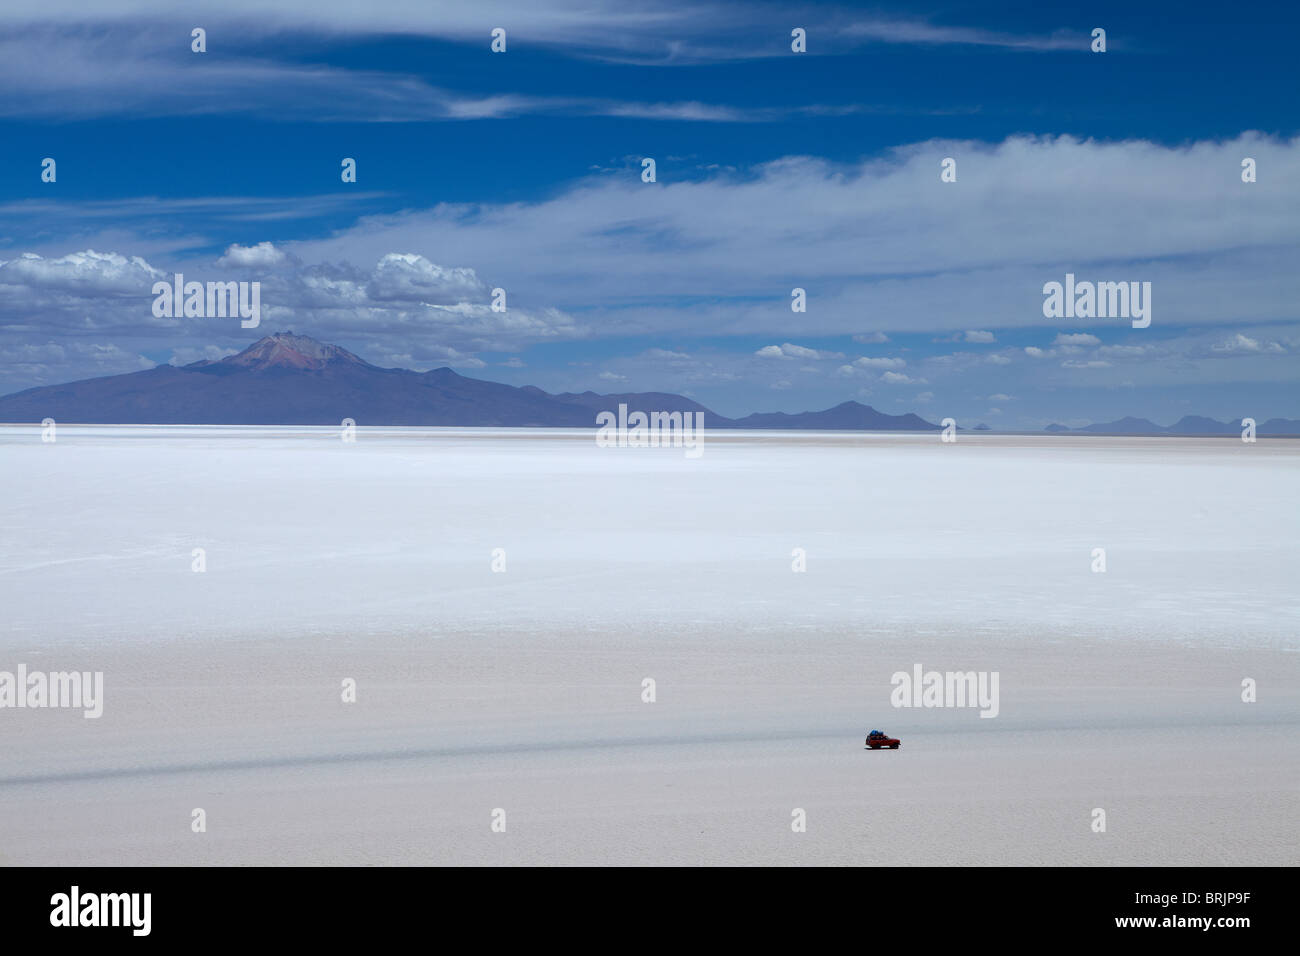 a lone vehicle on the Salar de Uyuni, Bolivia - Stock Image